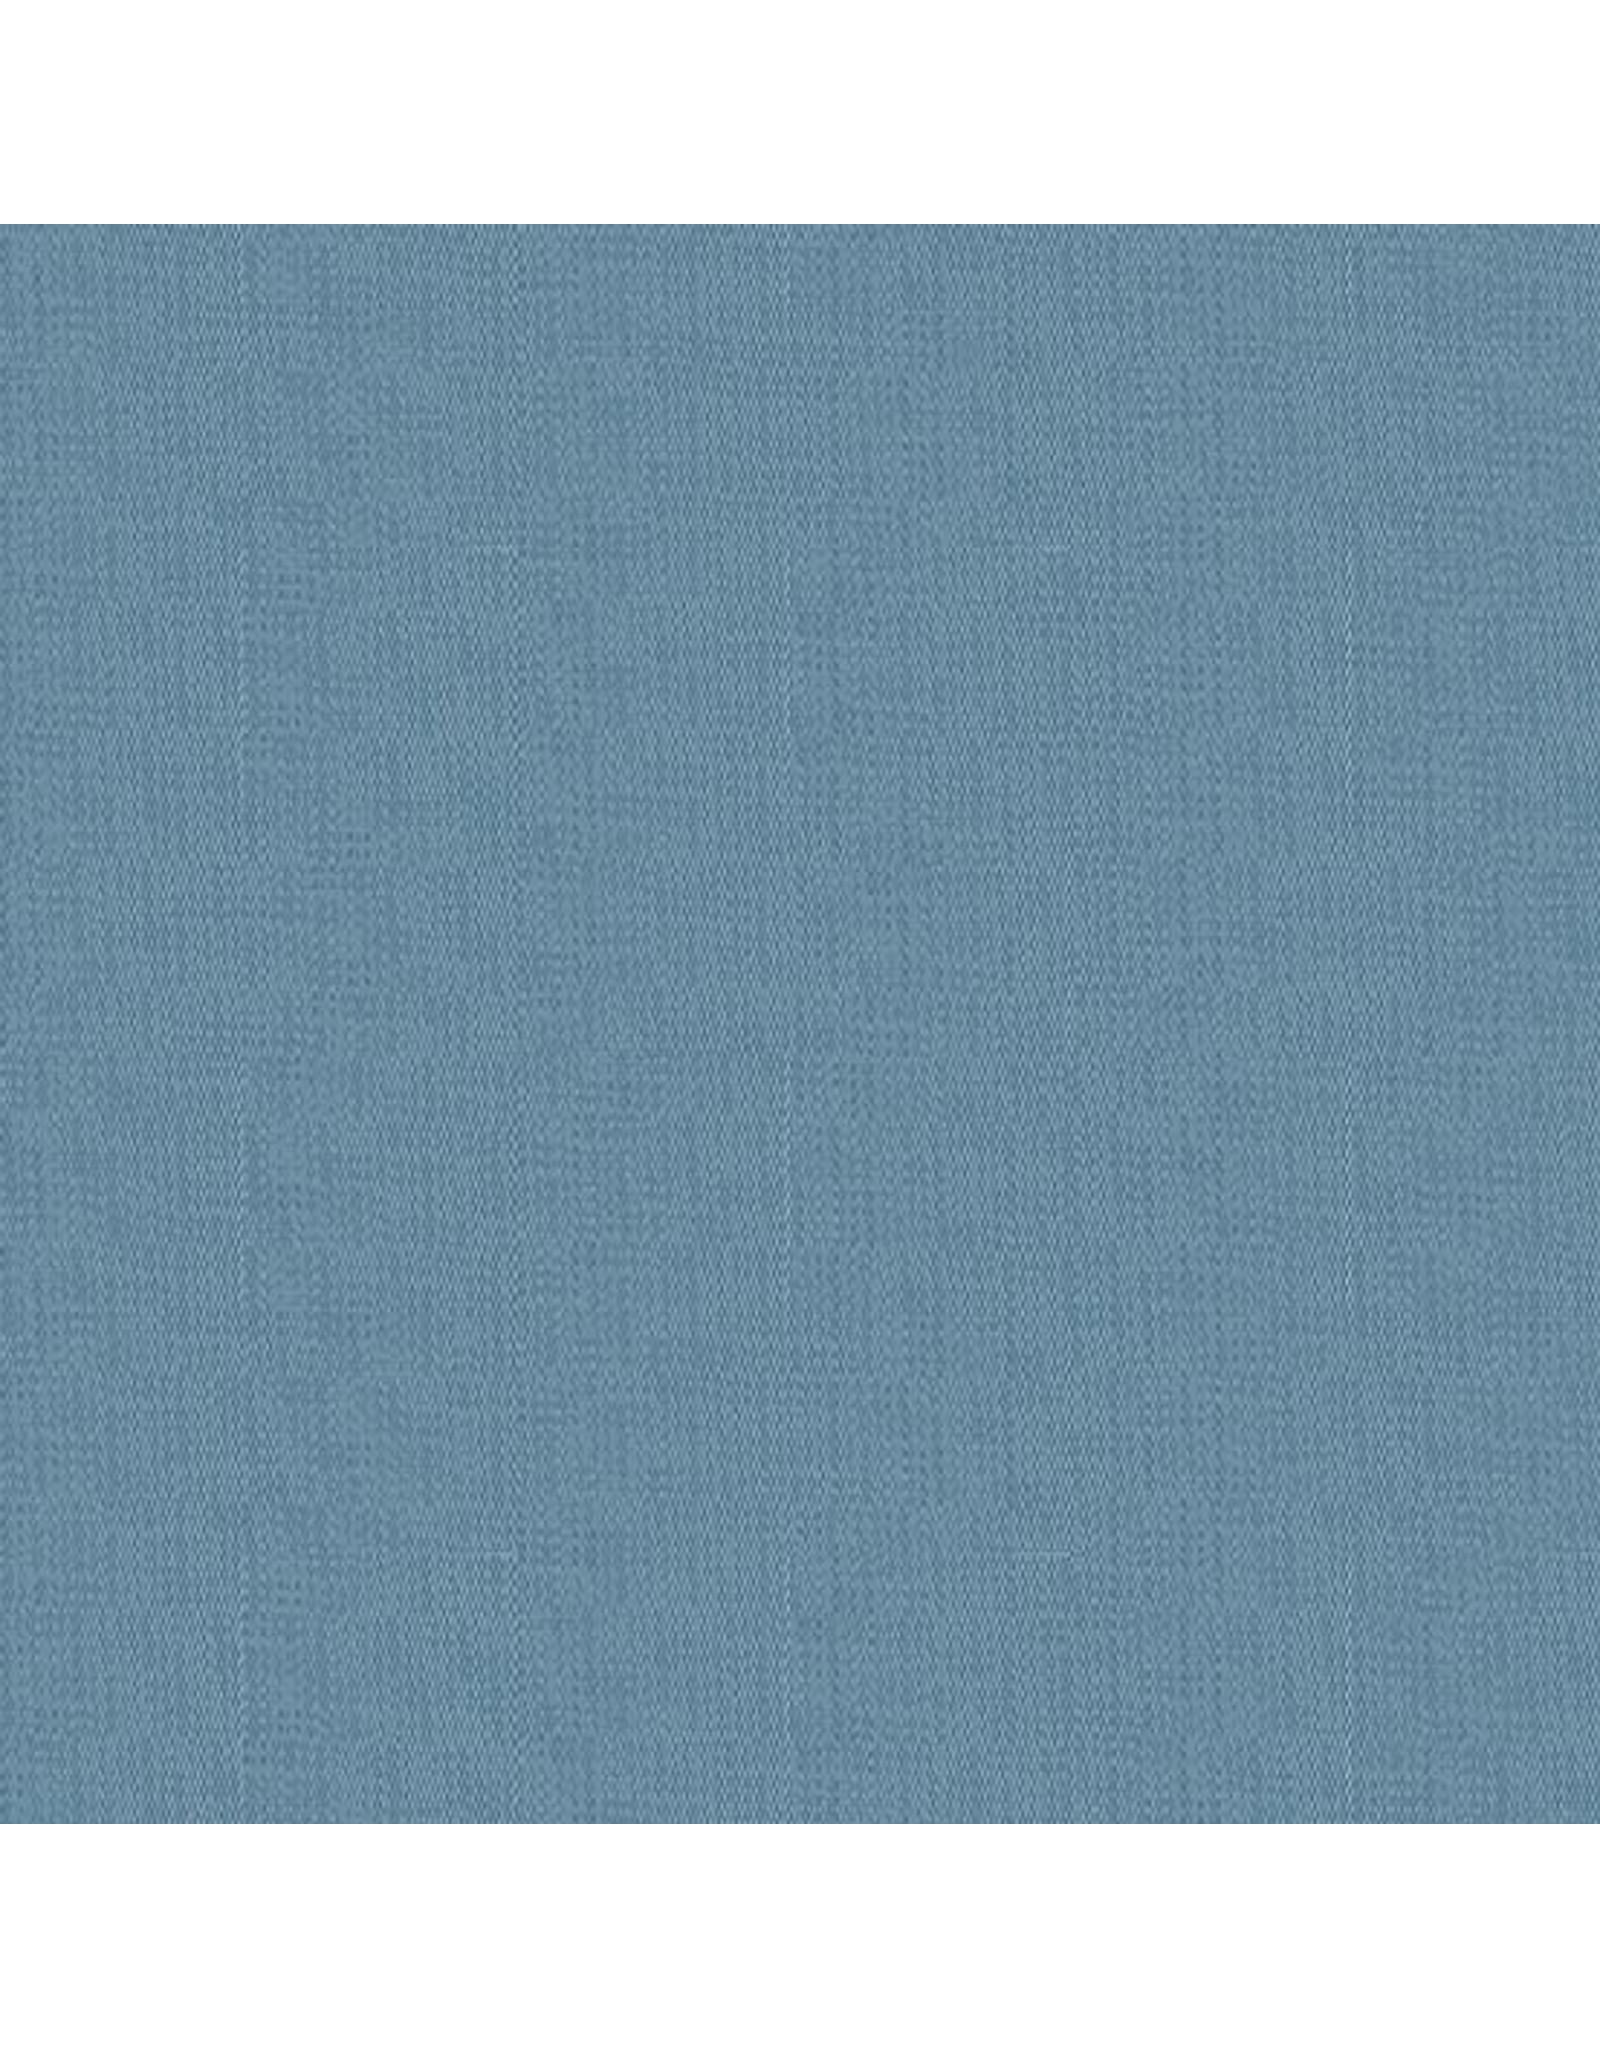 Alison Glass Kaleidoscope 2021 in Steel, Fabric Half-Yards